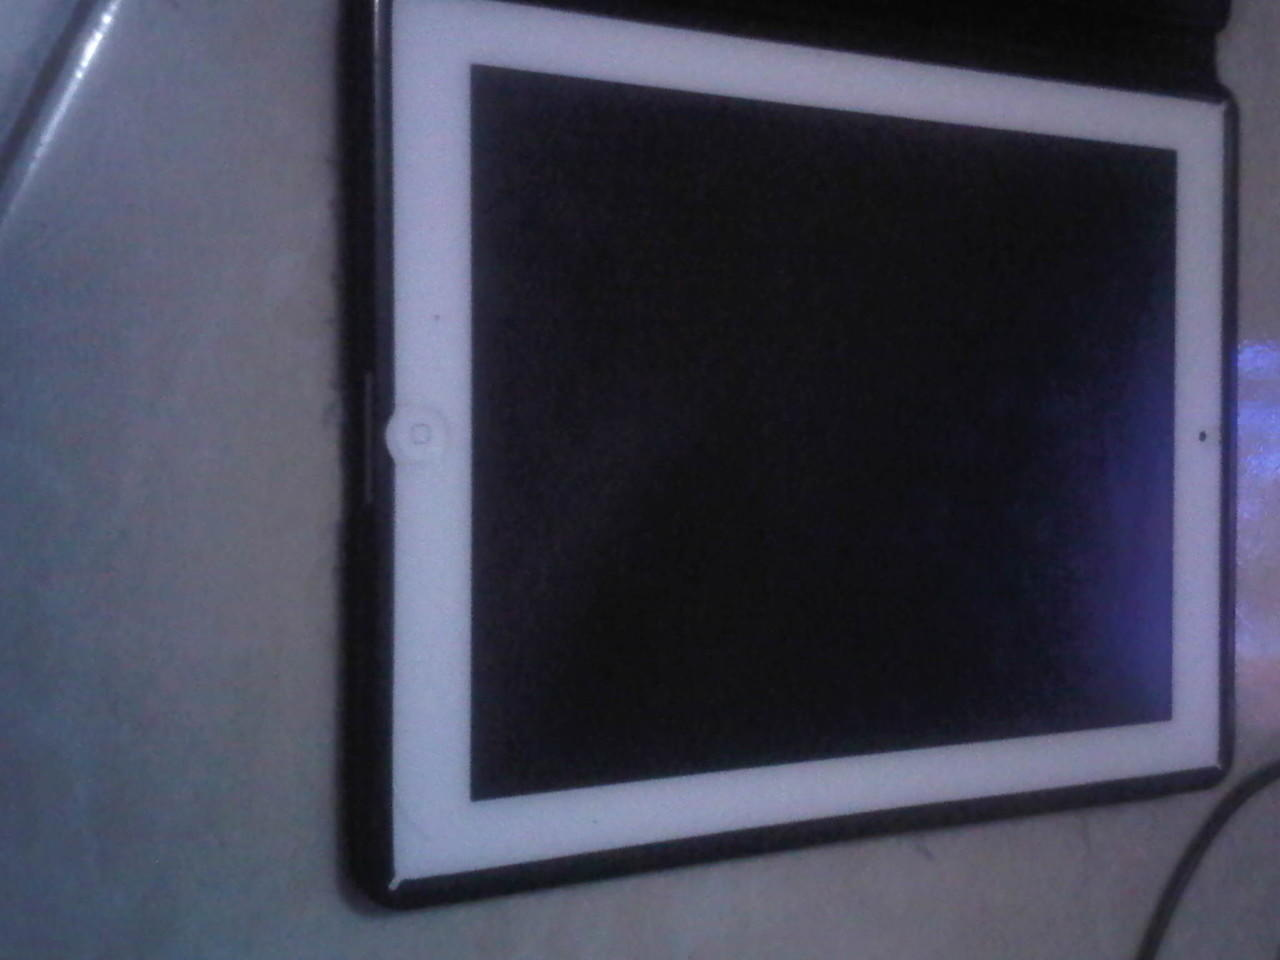 di jual ipad 3 32gb white 4g + wifi batangan